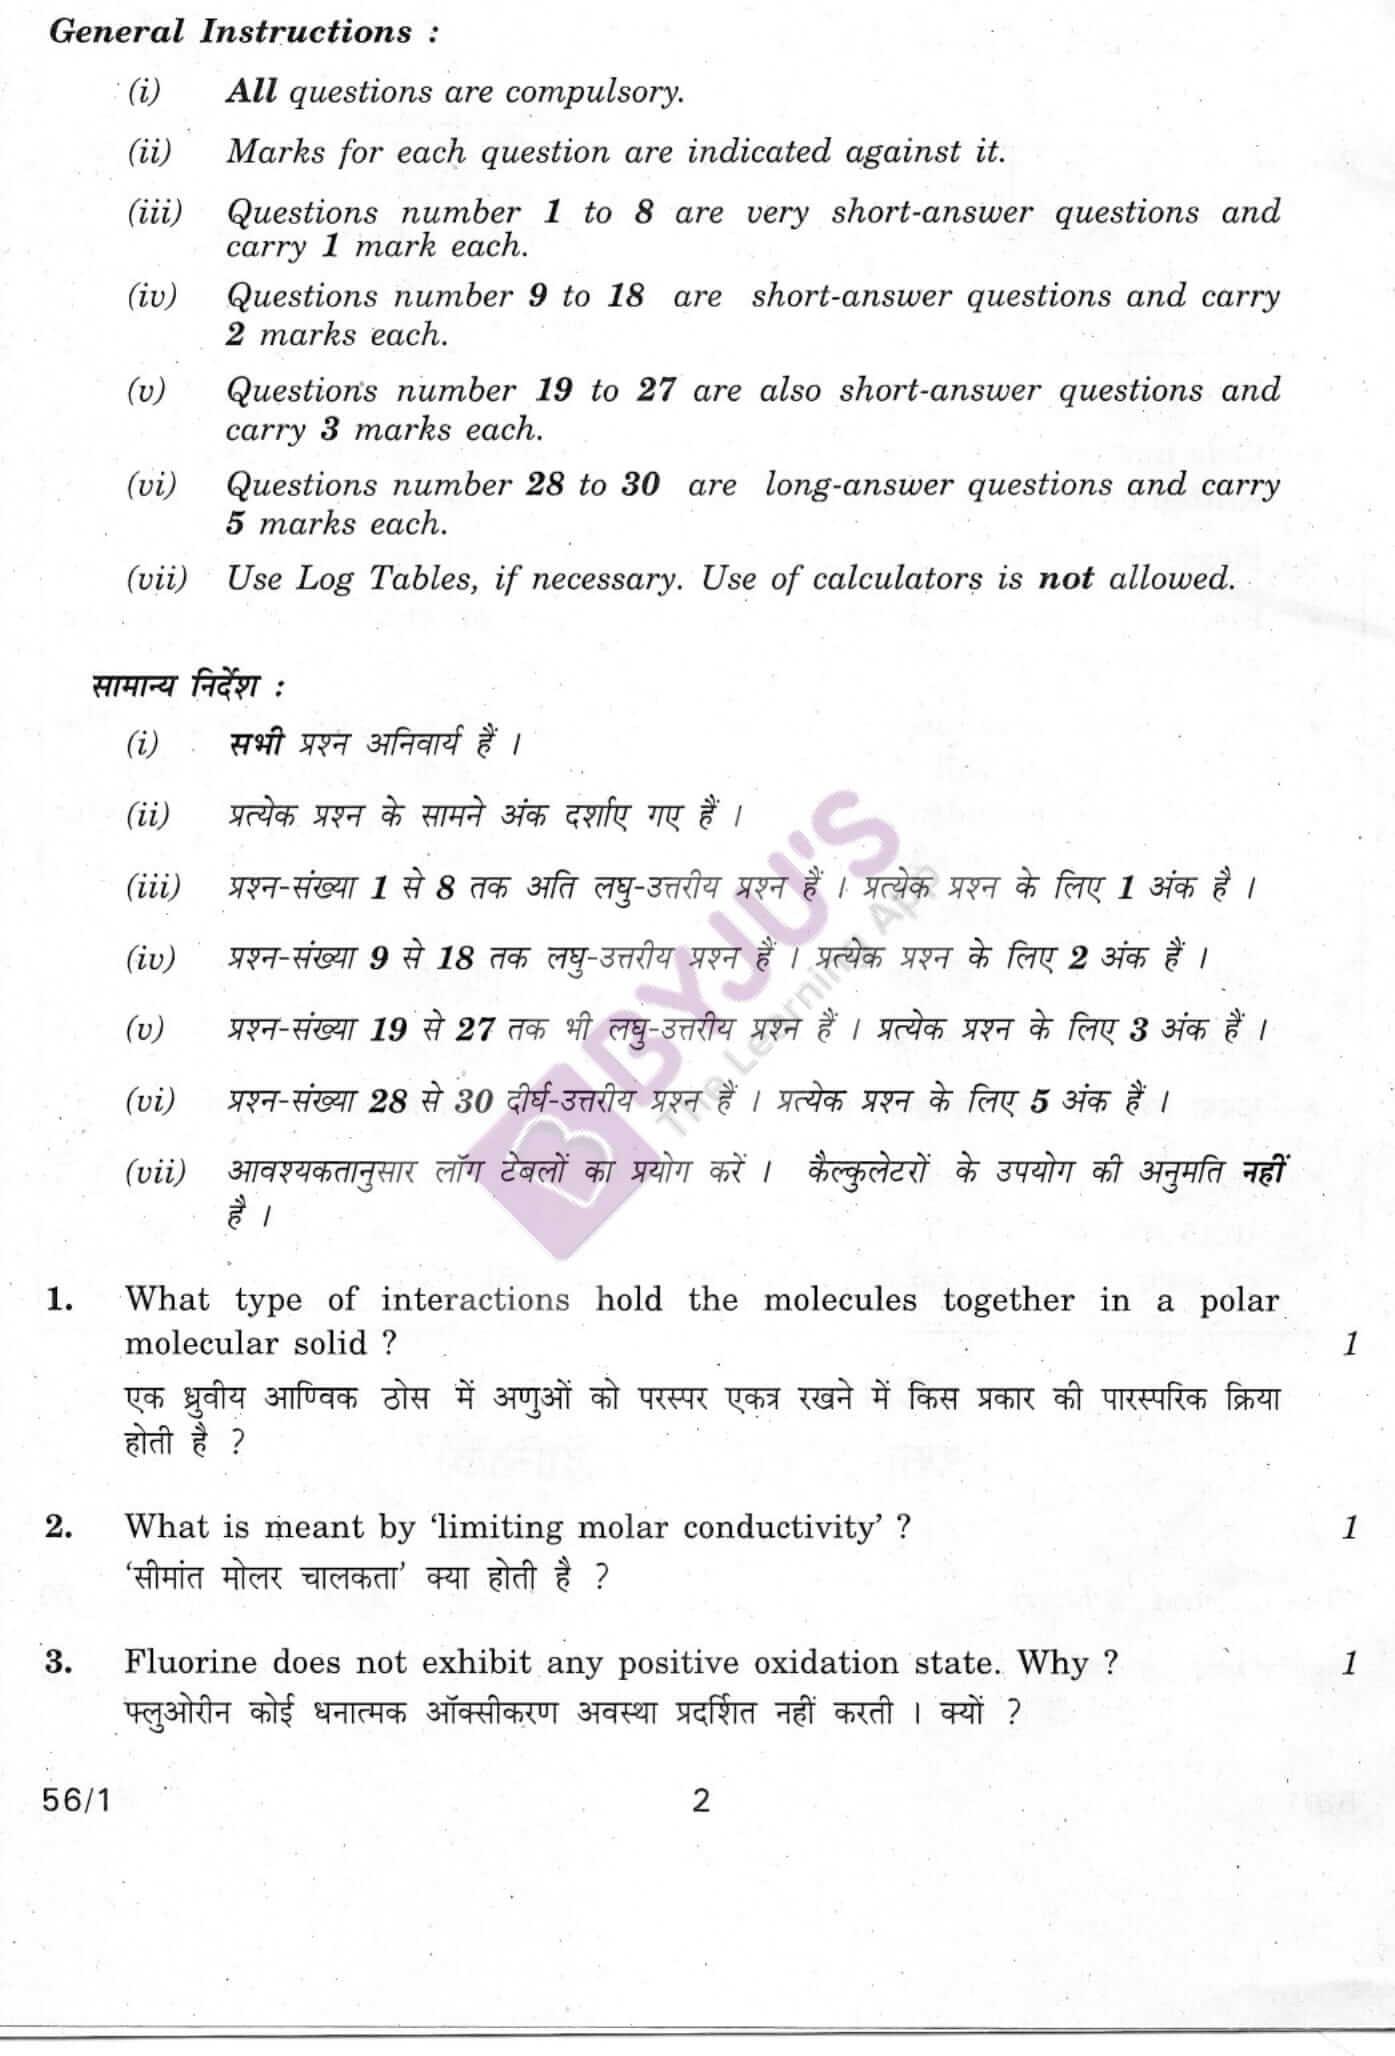 cbse class 12 chemistry question paper 2012 set 1